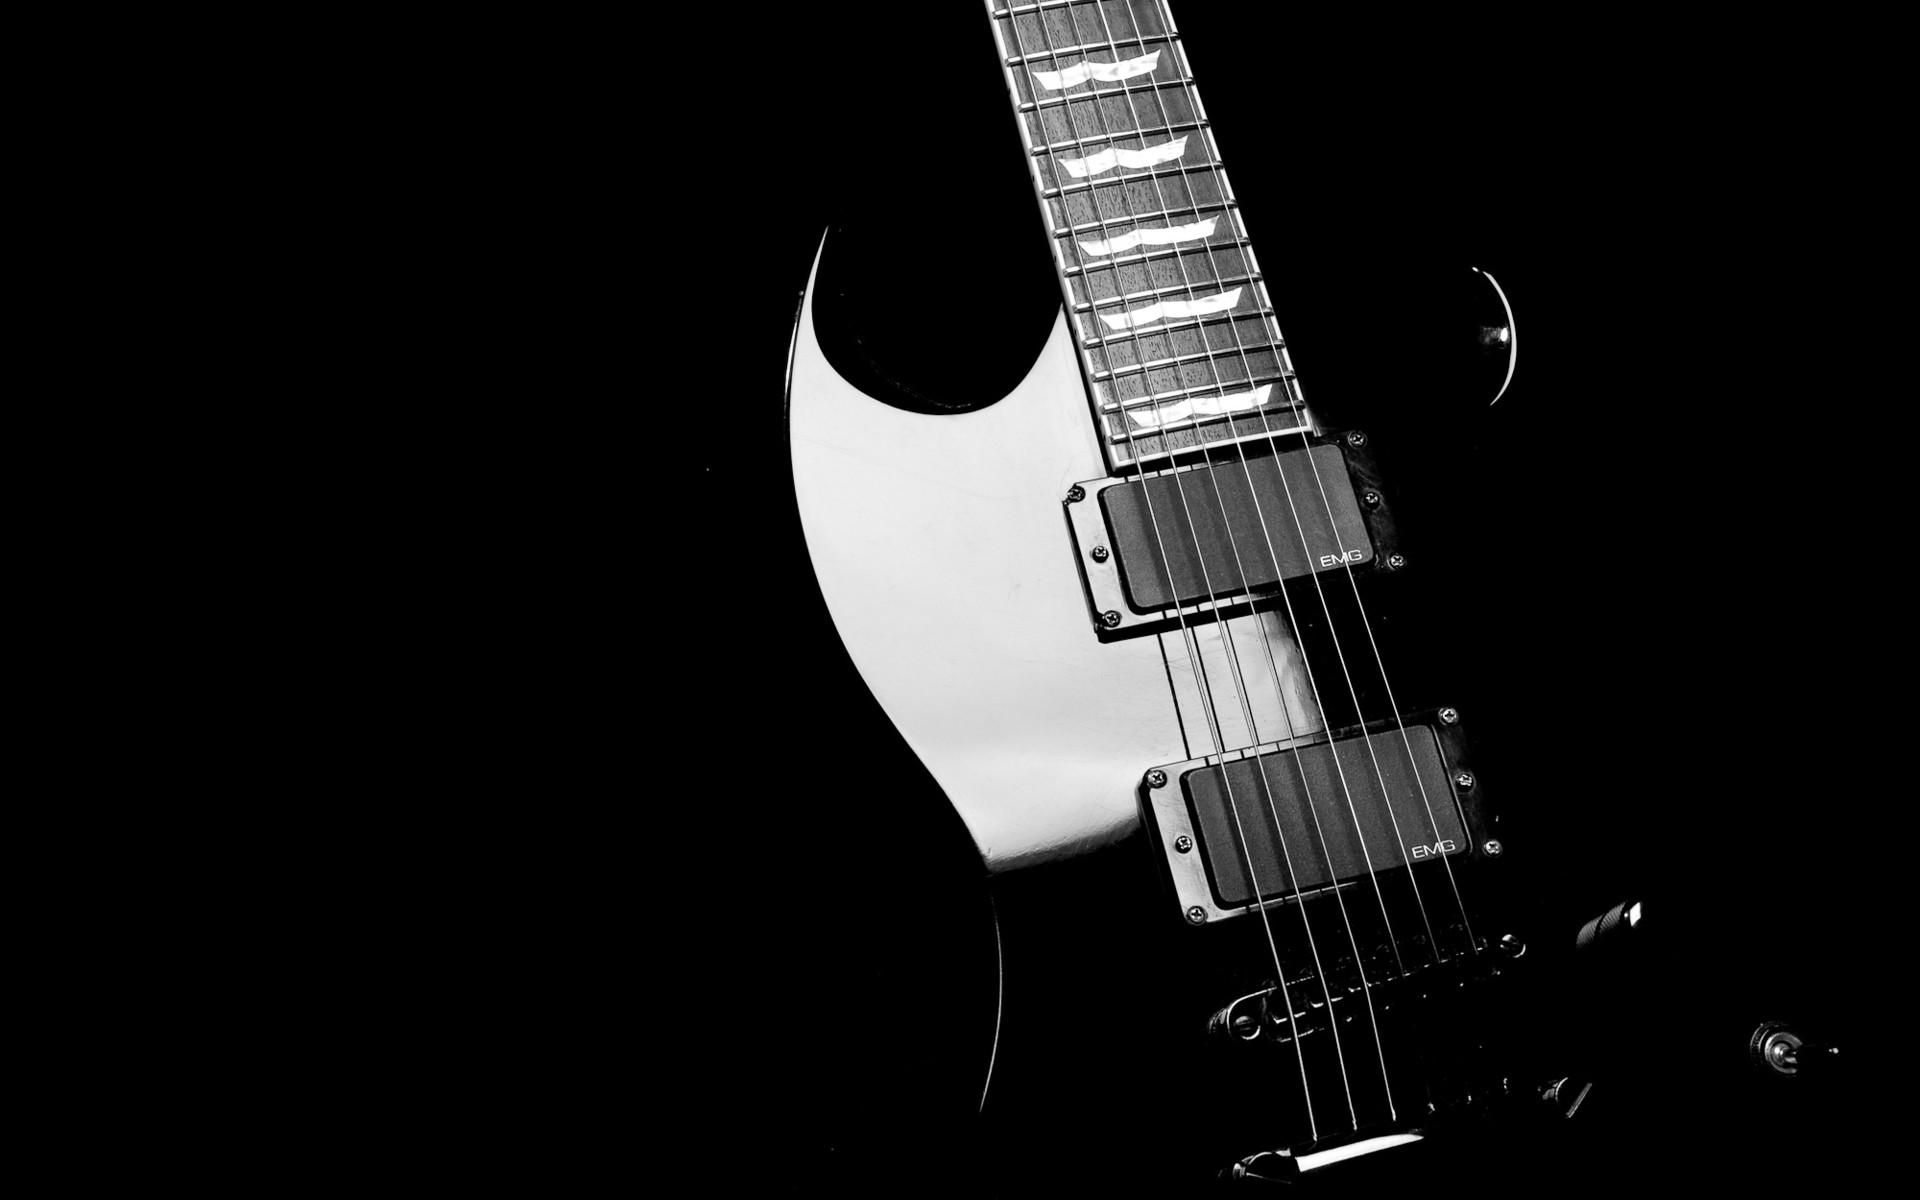 Res: 1920x1200, Download V.533 - Wallpapers Guitar, ModaFinilsale.com